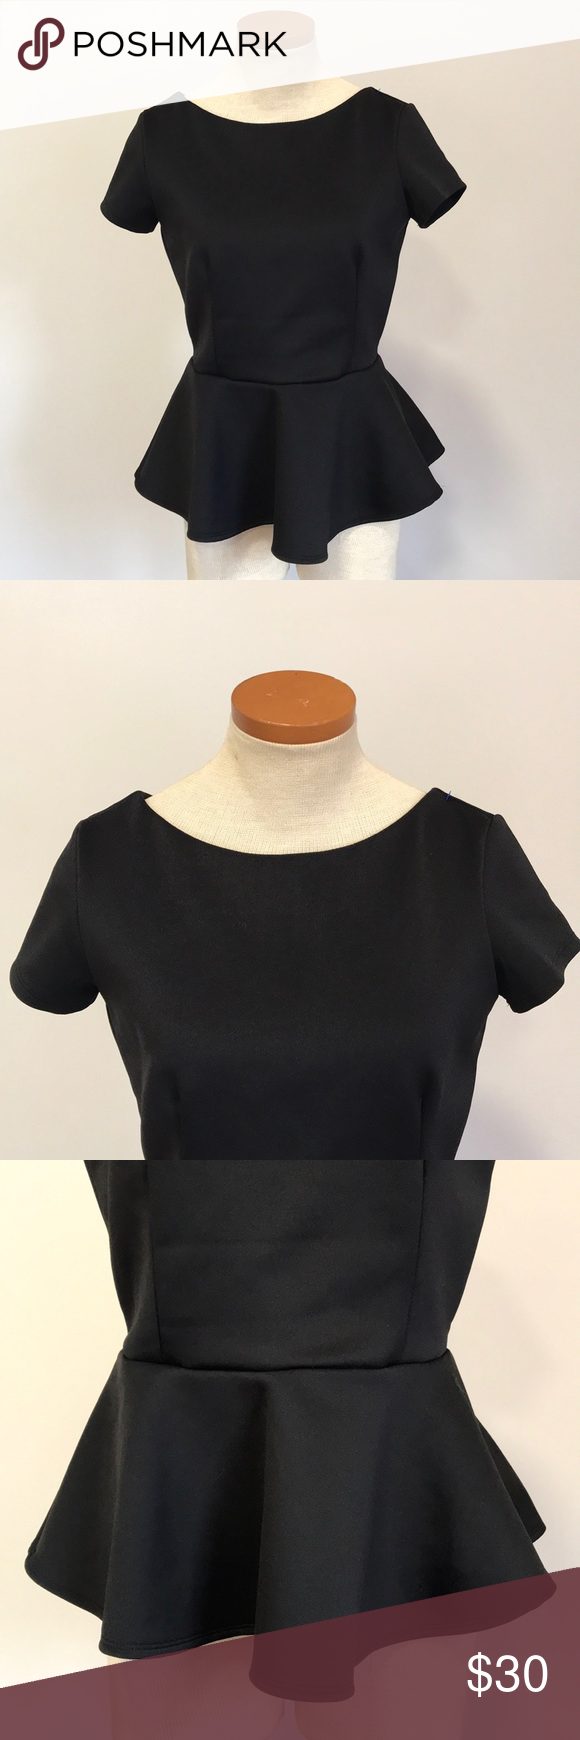 Bisou Bisou Black Dress Top Black Dress Top Size Small Bisou Bisou Tops Blouses Clothes Design Fashion Design Plus Fashion [ 1740 x 580 Pixel ]